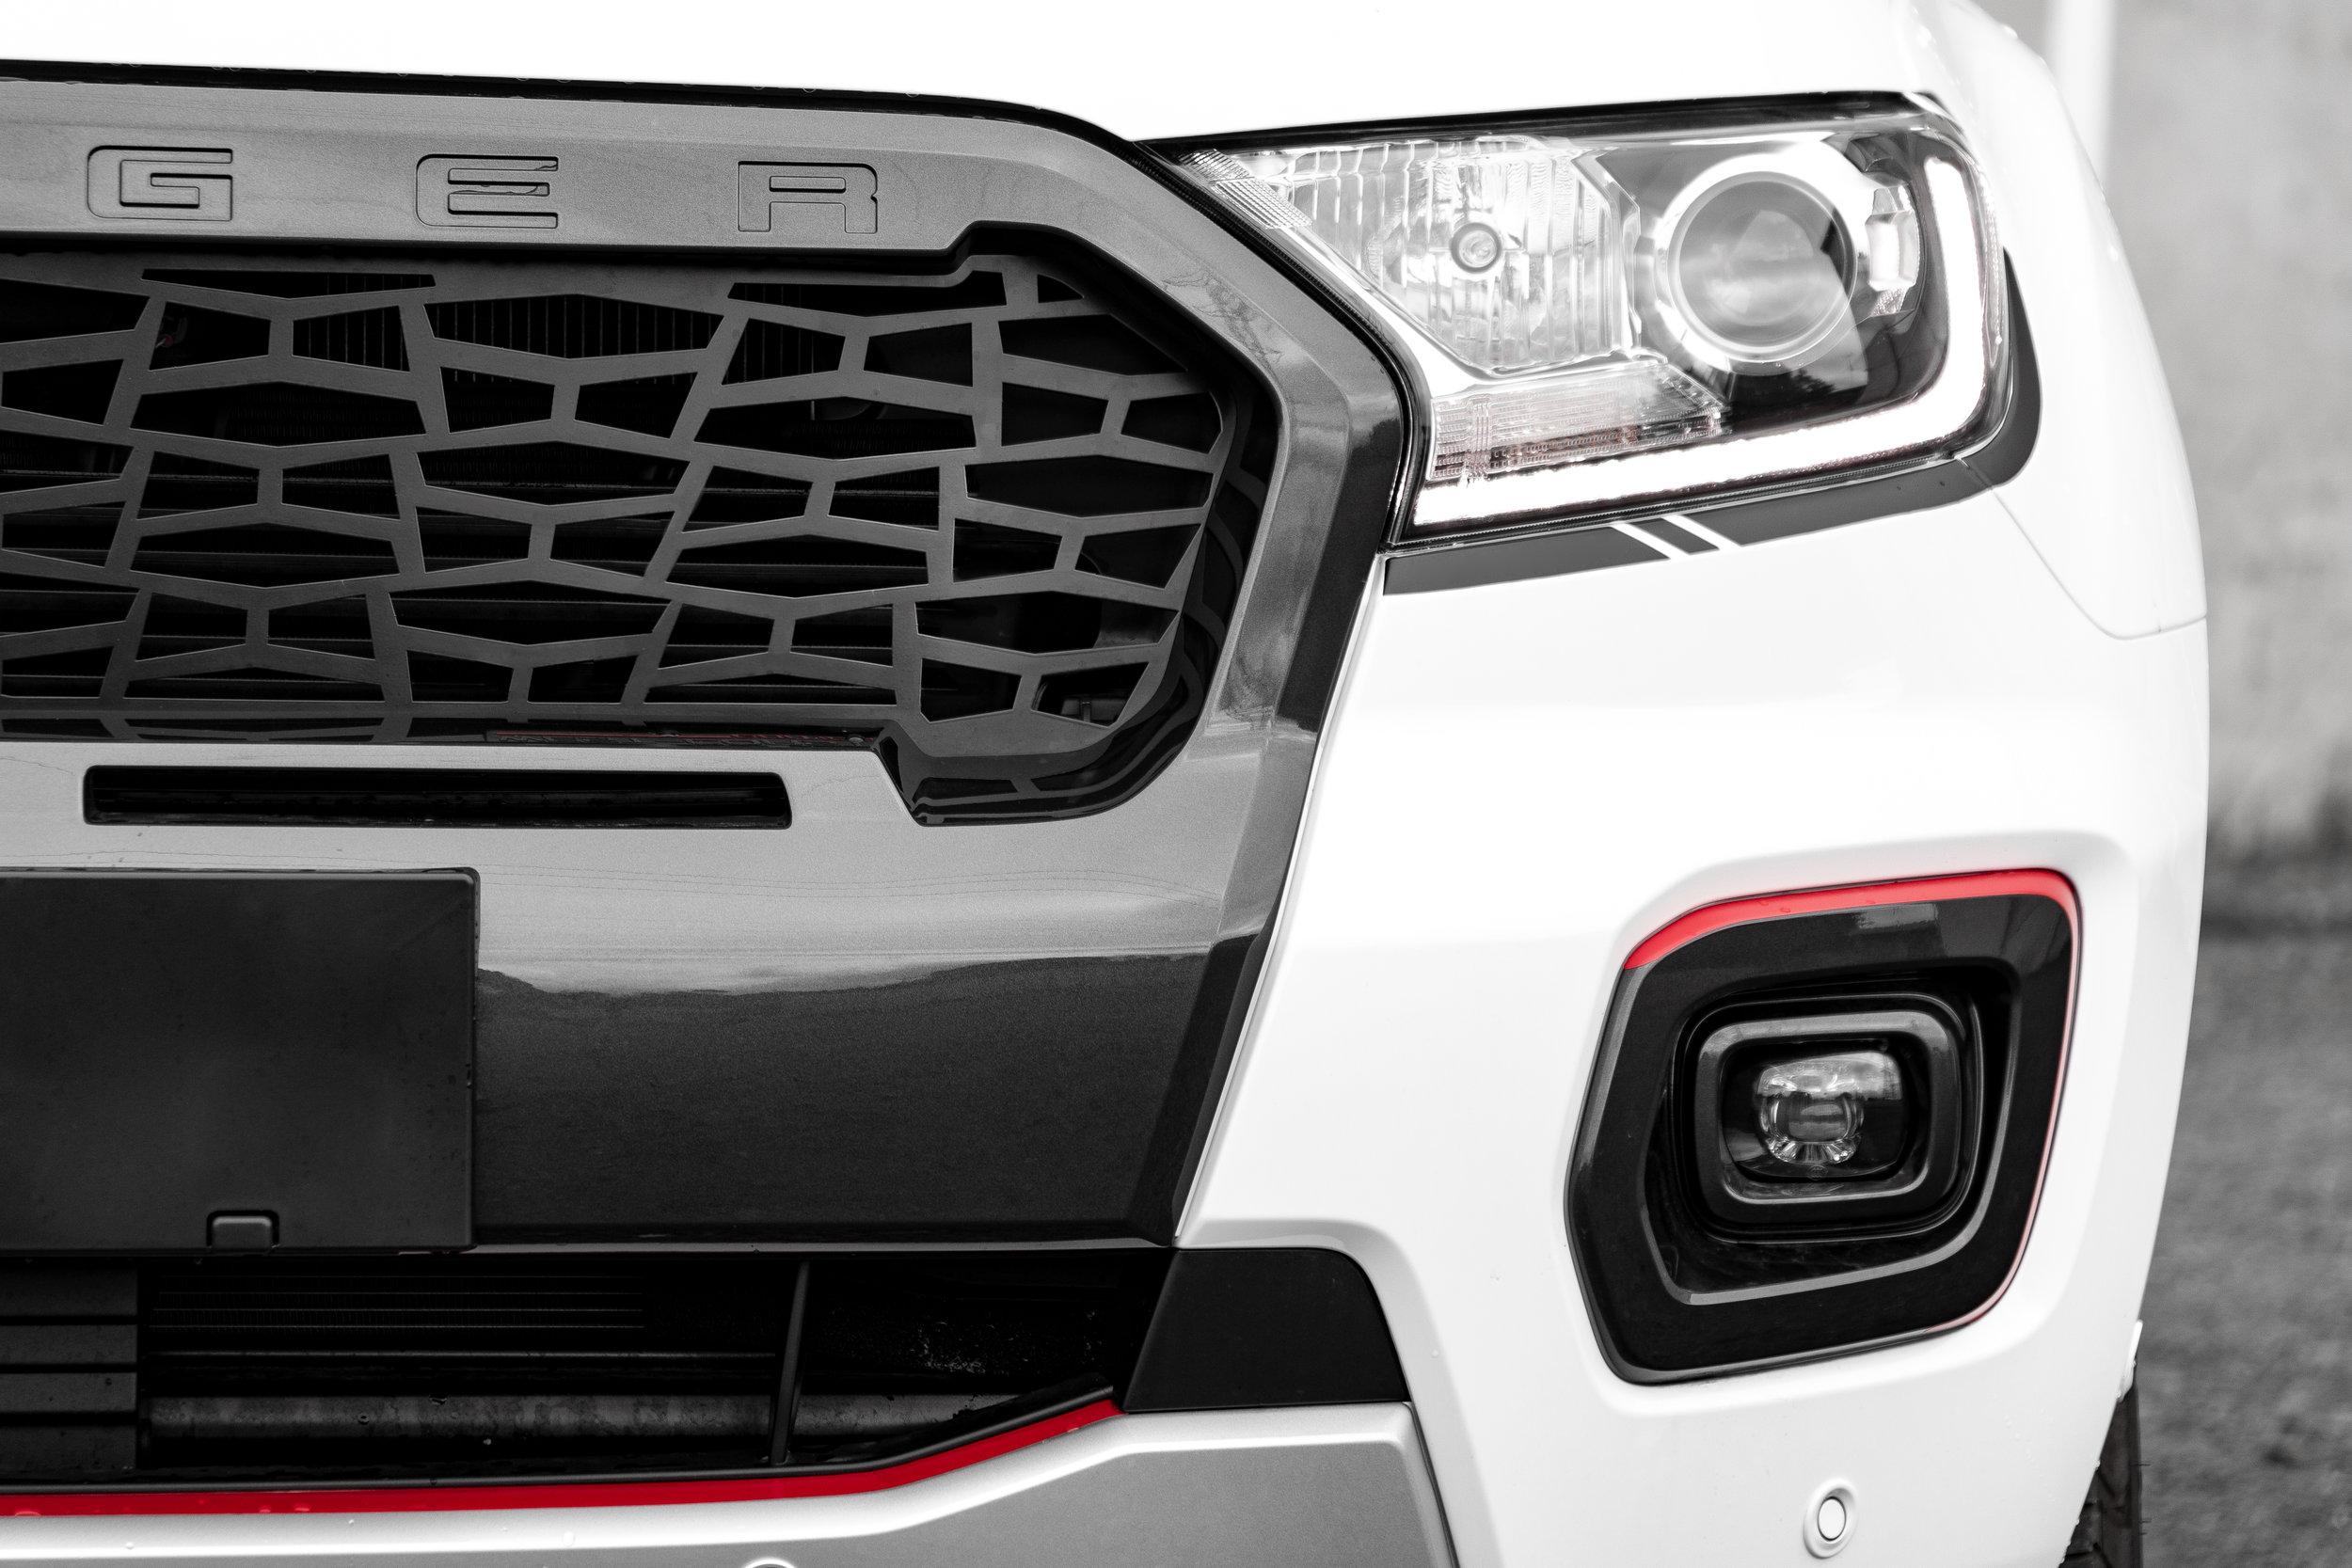 RVE-Ford-Ranger-Plain-Grille-Mesh-Insert-without-Lights-Upgrade-1.jpg